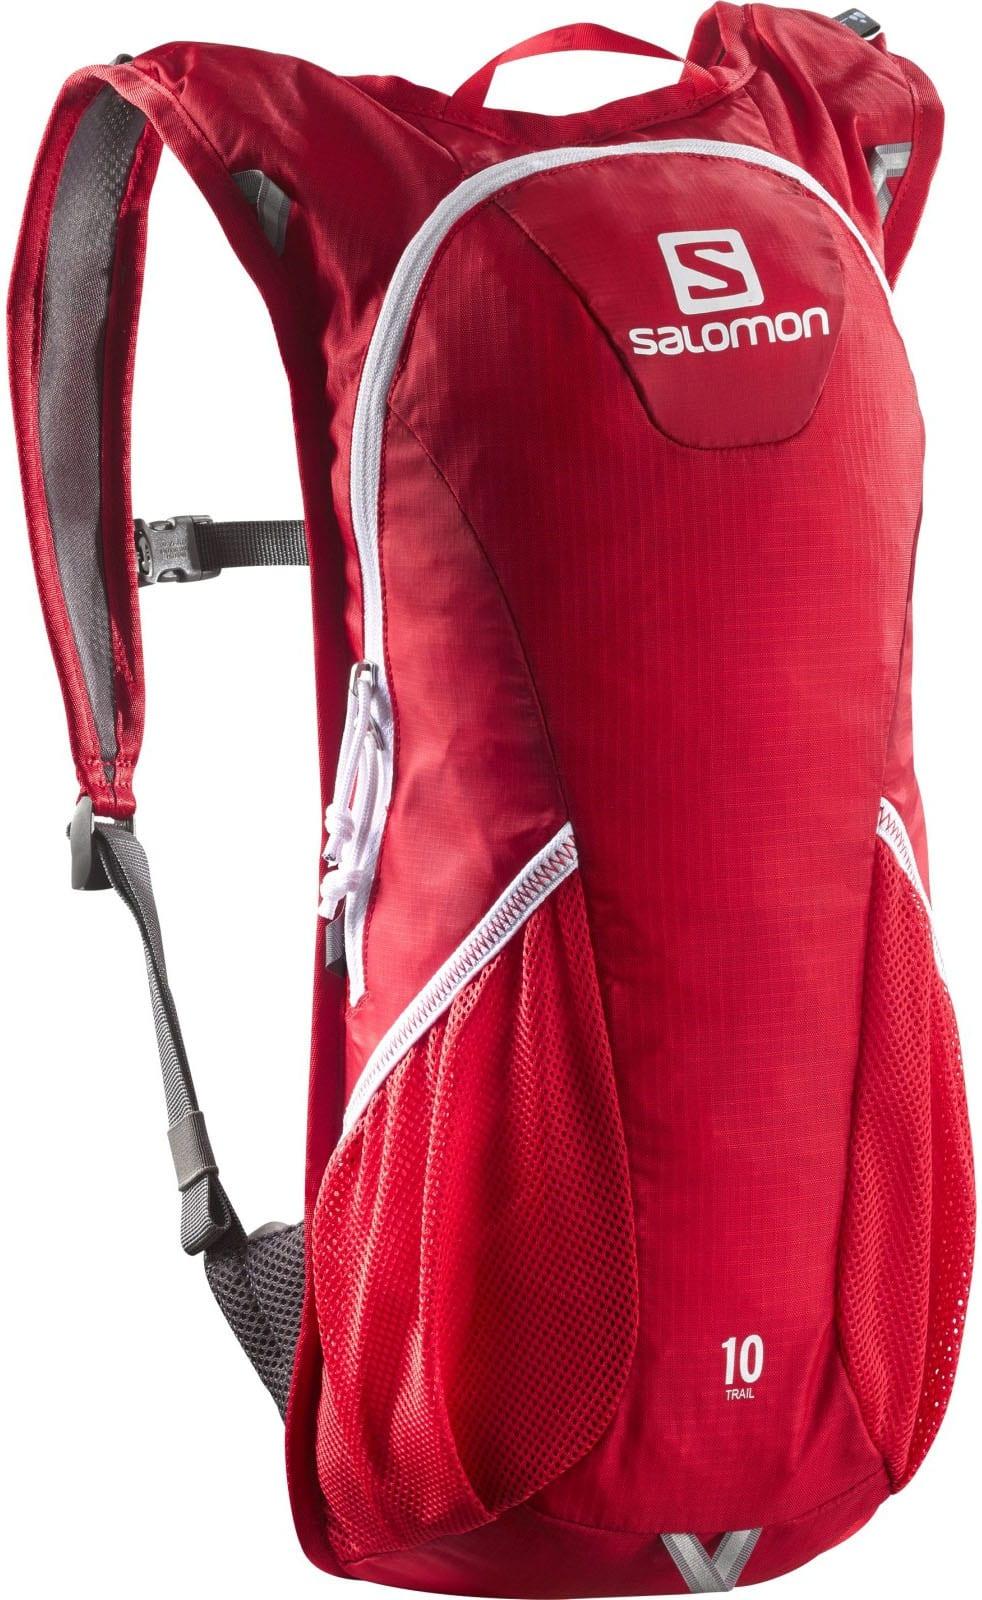 Salomon Trail 10 Set Hydration Backpack Mens Sz 10l